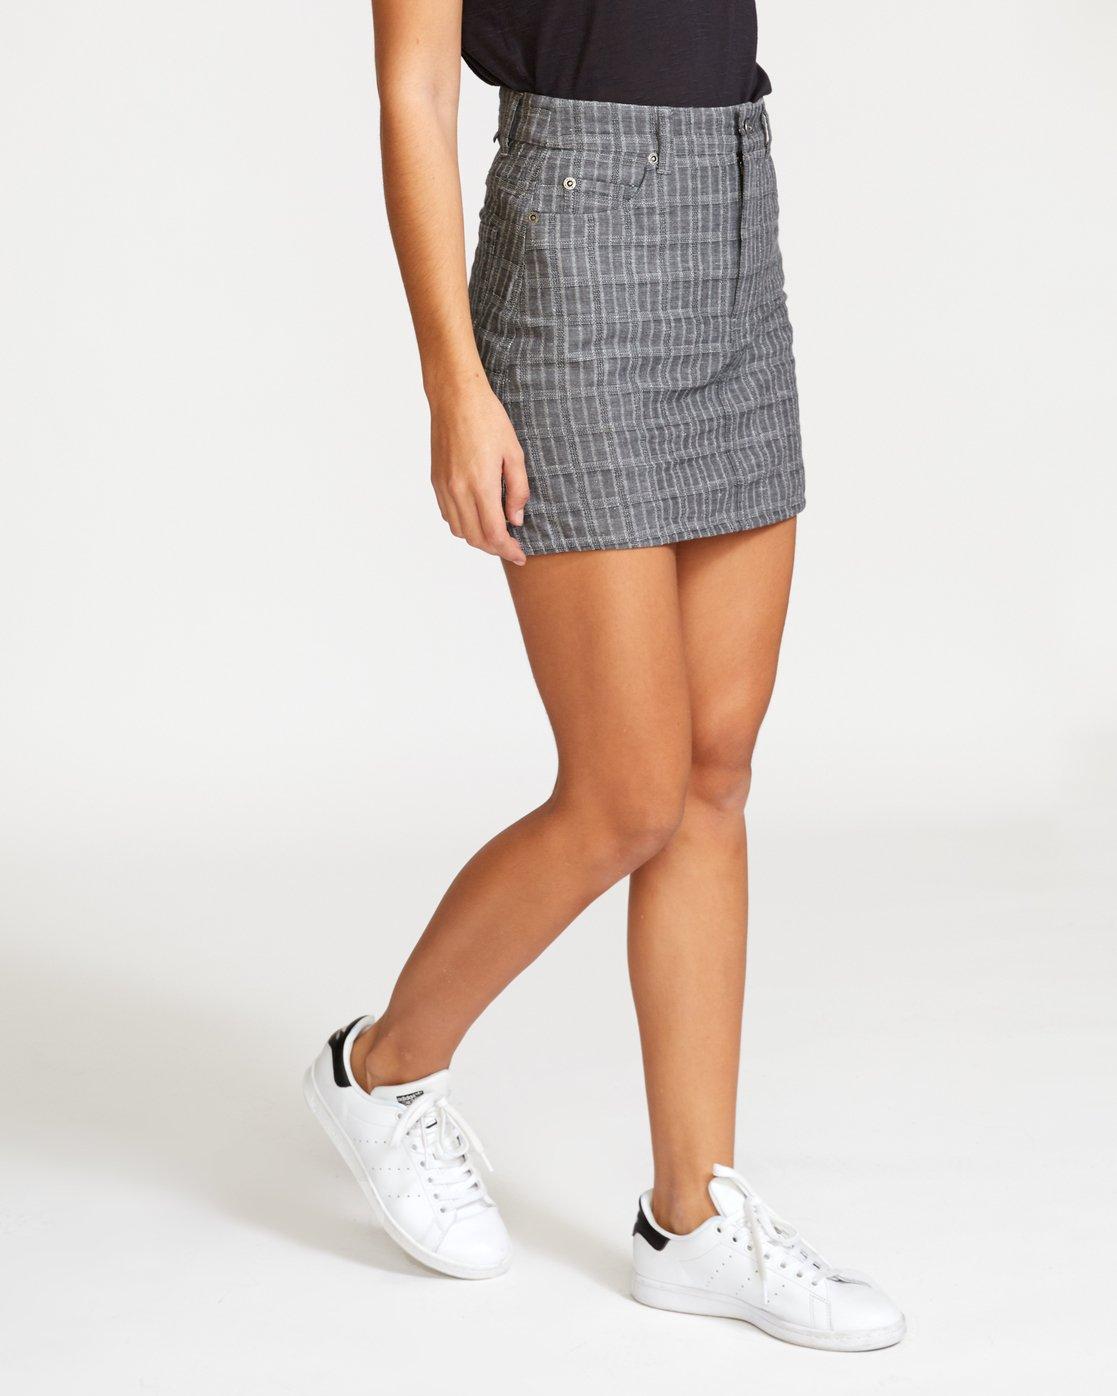 4 Rowdy Plaid  - Jeans-Minirock für Frauen  Q3SKRDRVF9 RVCA